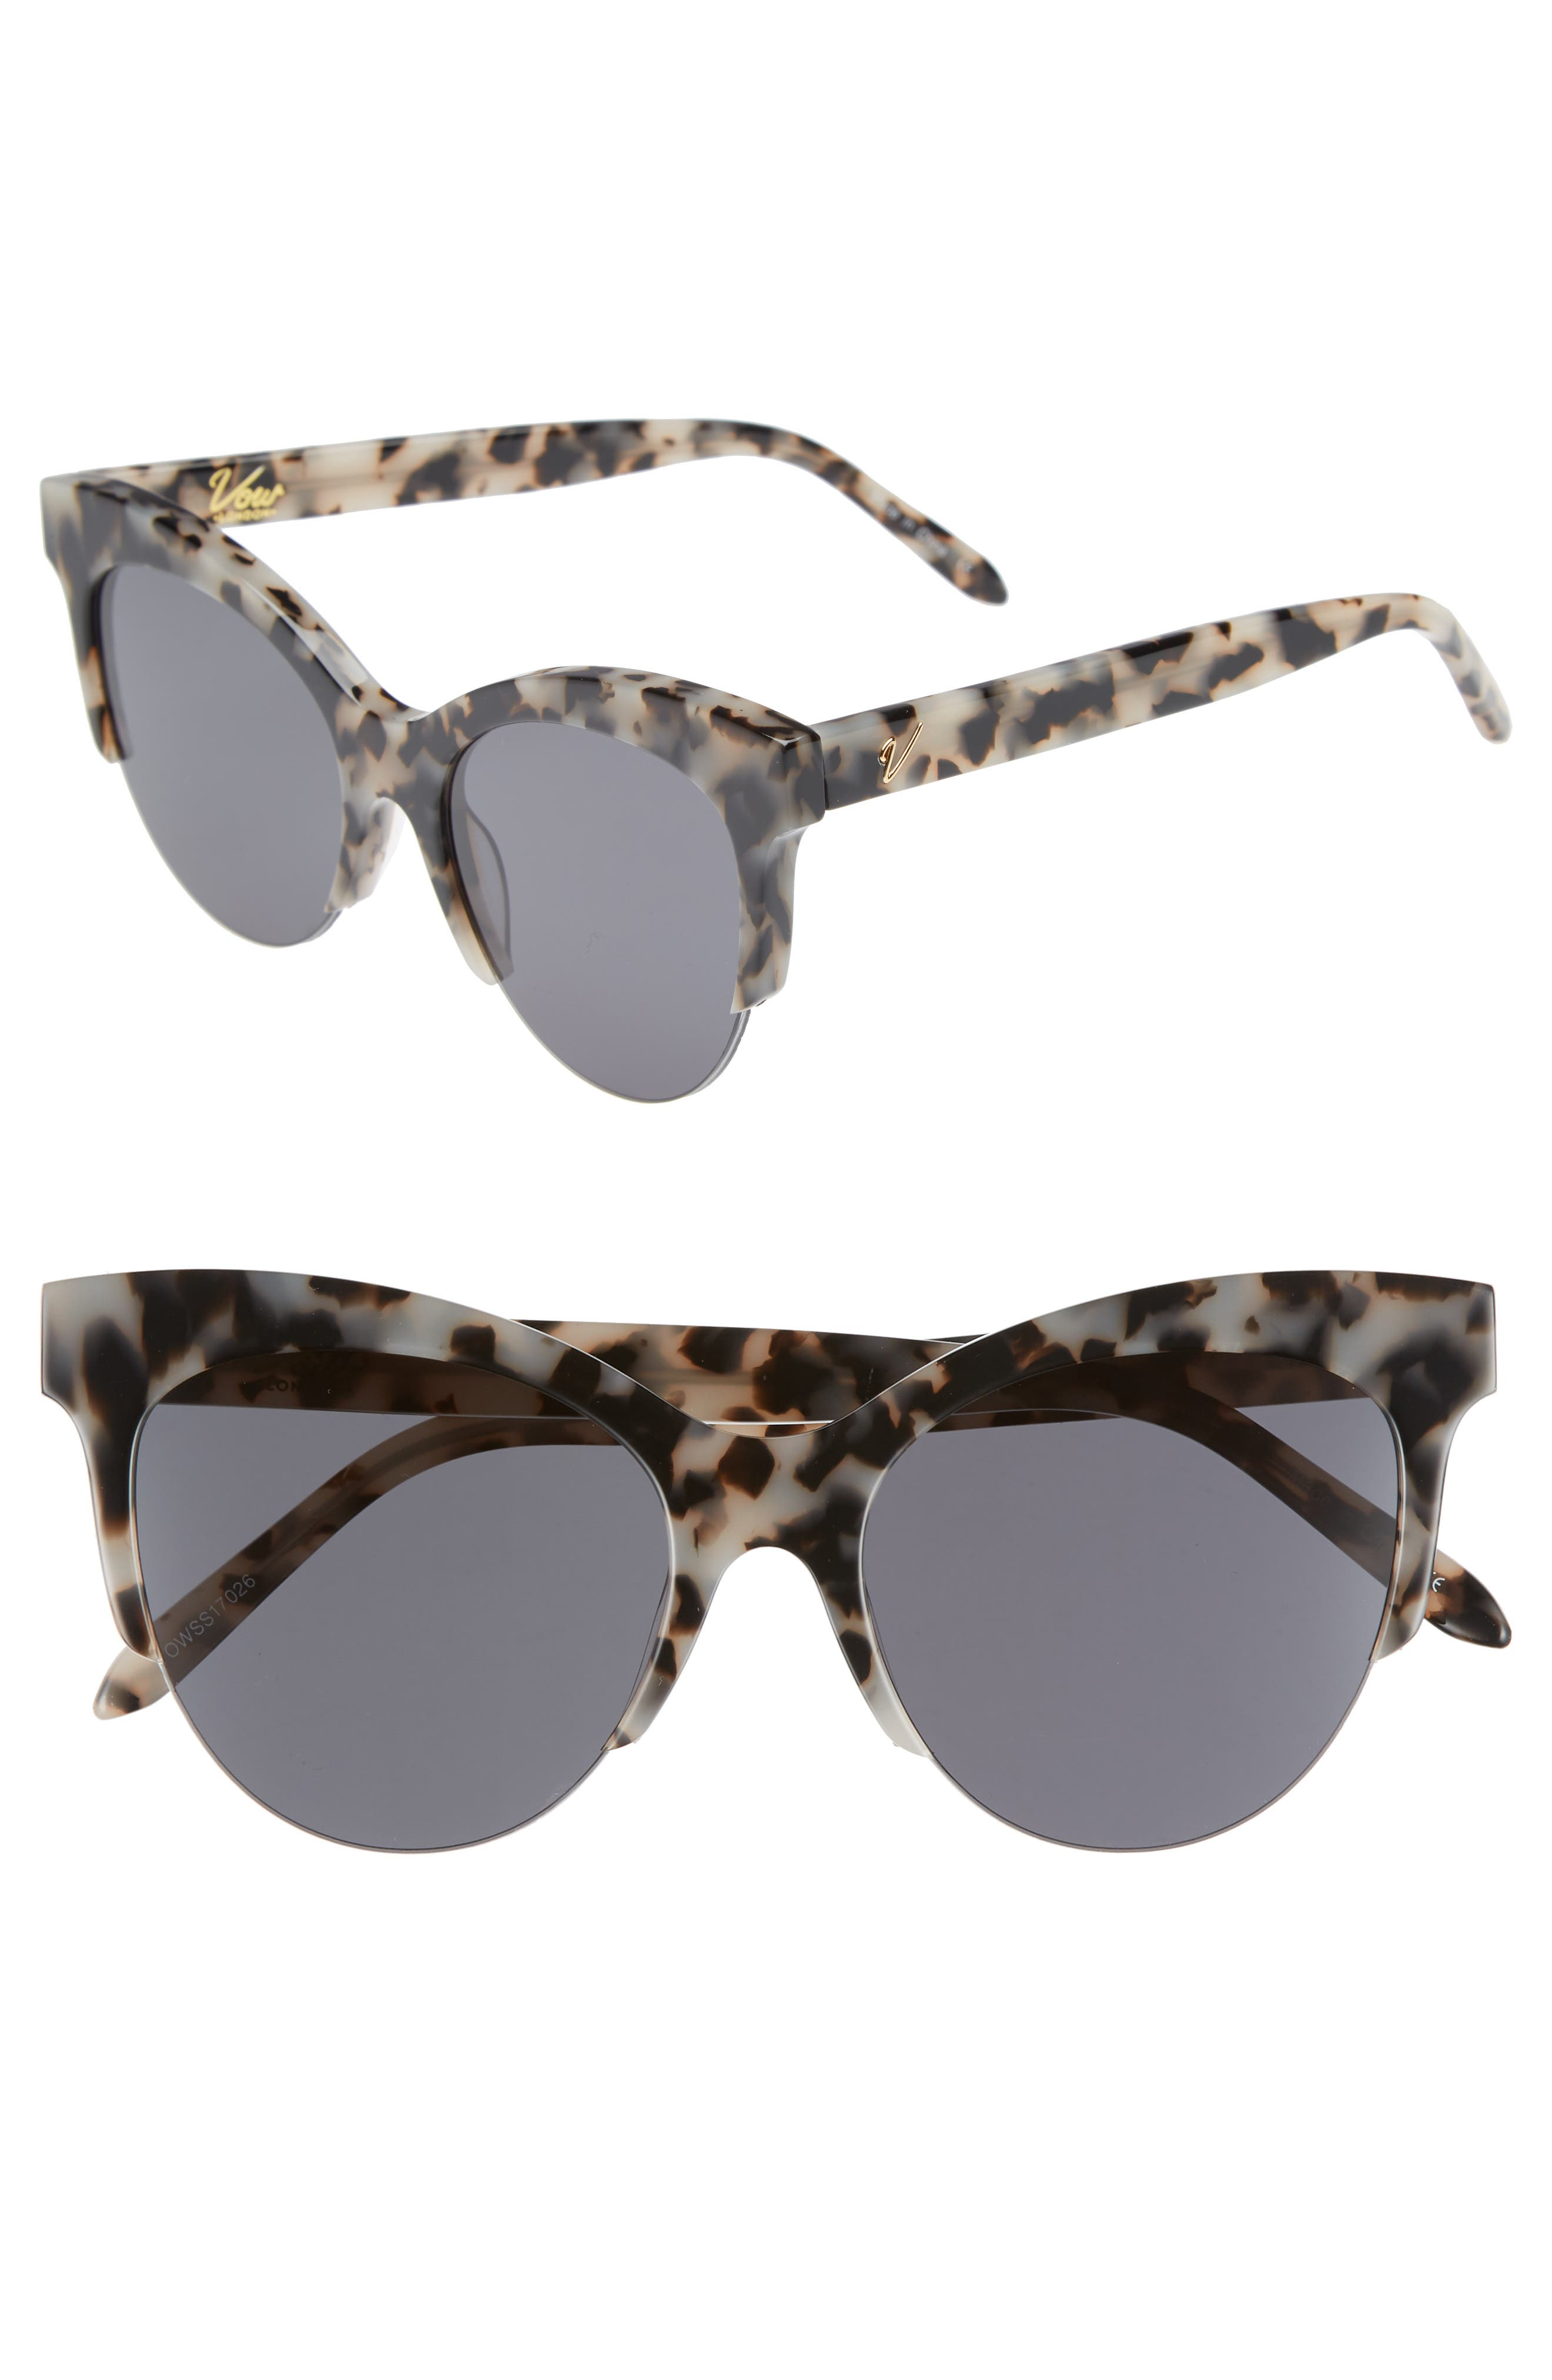 Cody 53mm Cat Eye Sunglasses,                             Main thumbnail 1, color,                             MILKY TORTOISE/ SMOKE